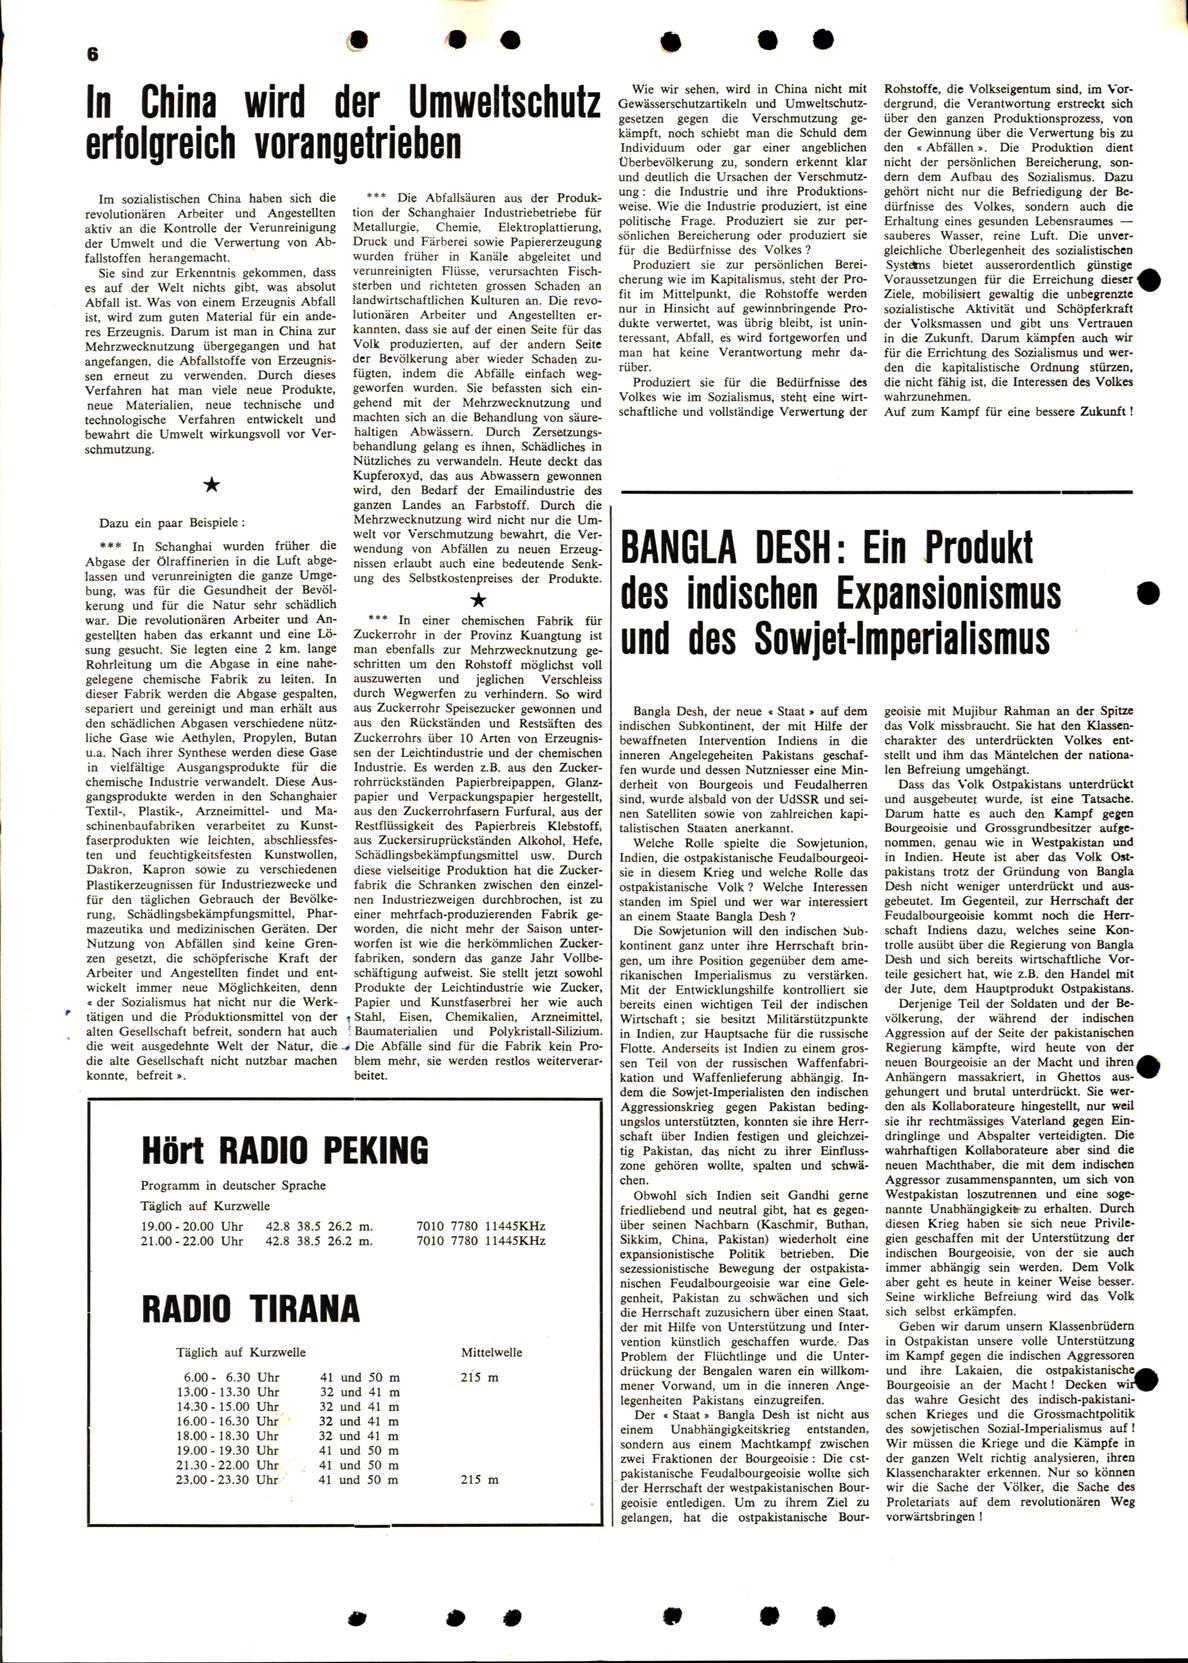 Schweiz_KPSML_Oktober_19720300_048_006